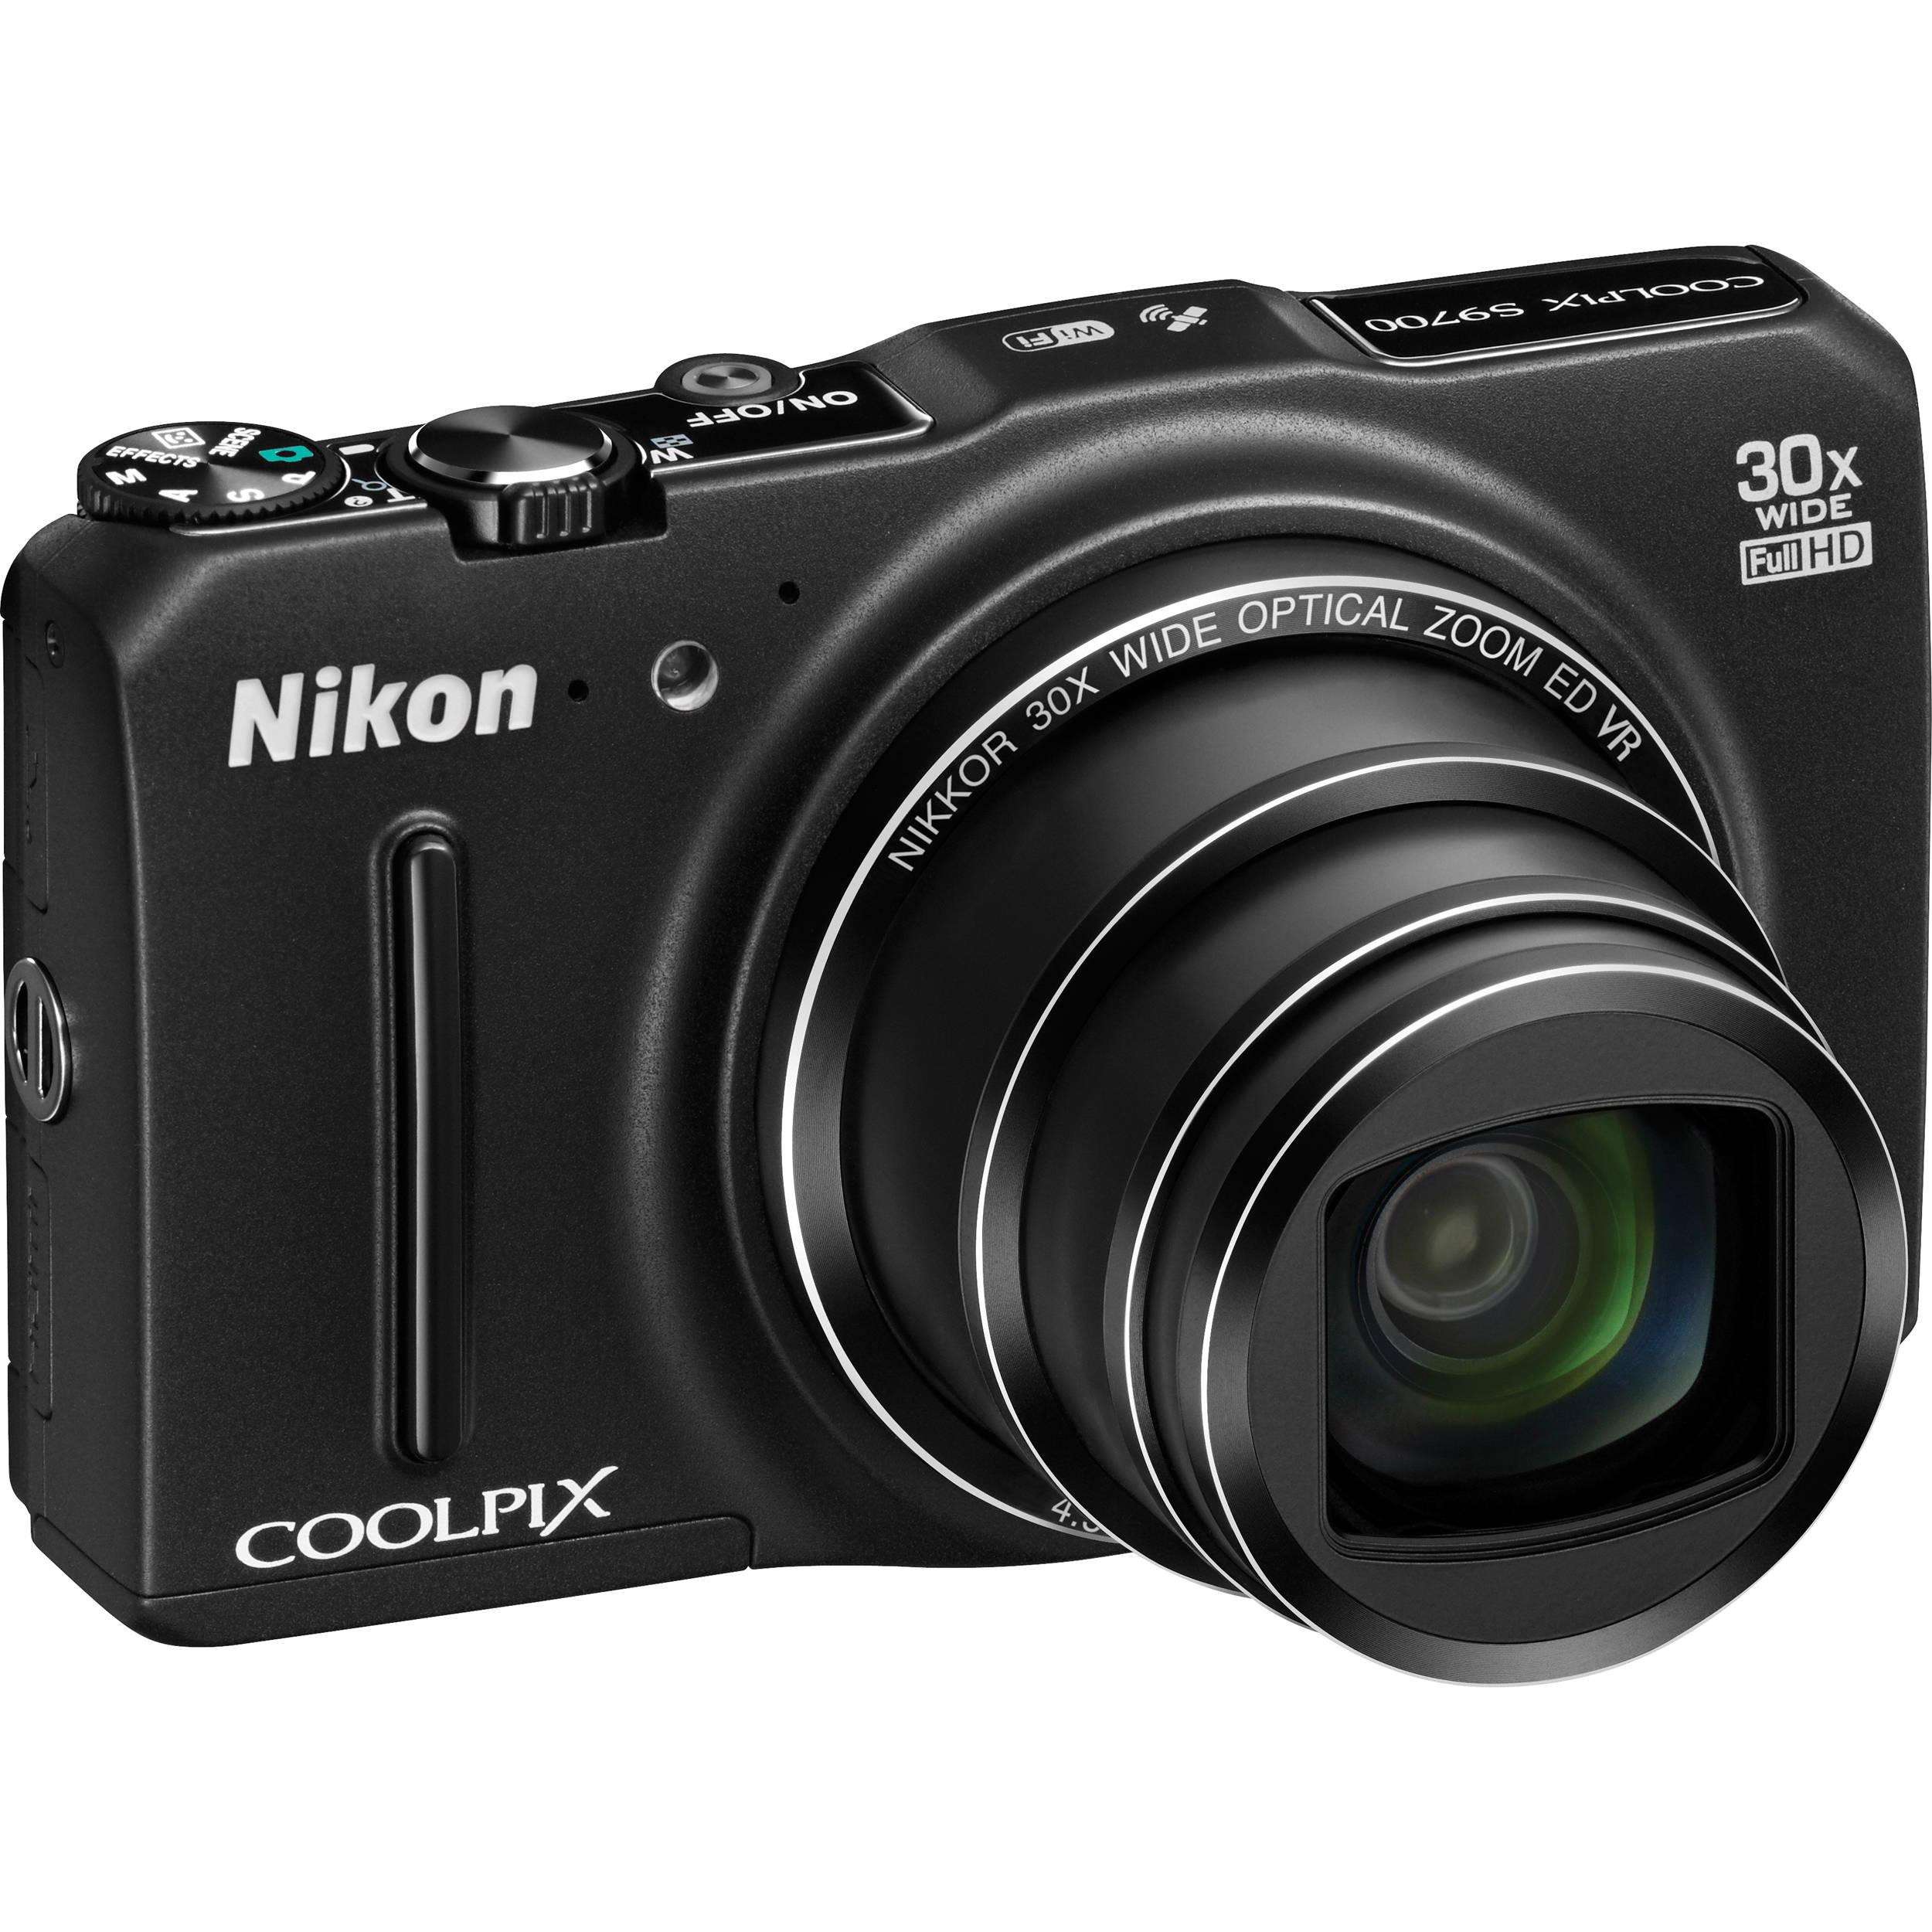 NIKON COOLPIX S9700 CAMERA UPDATE